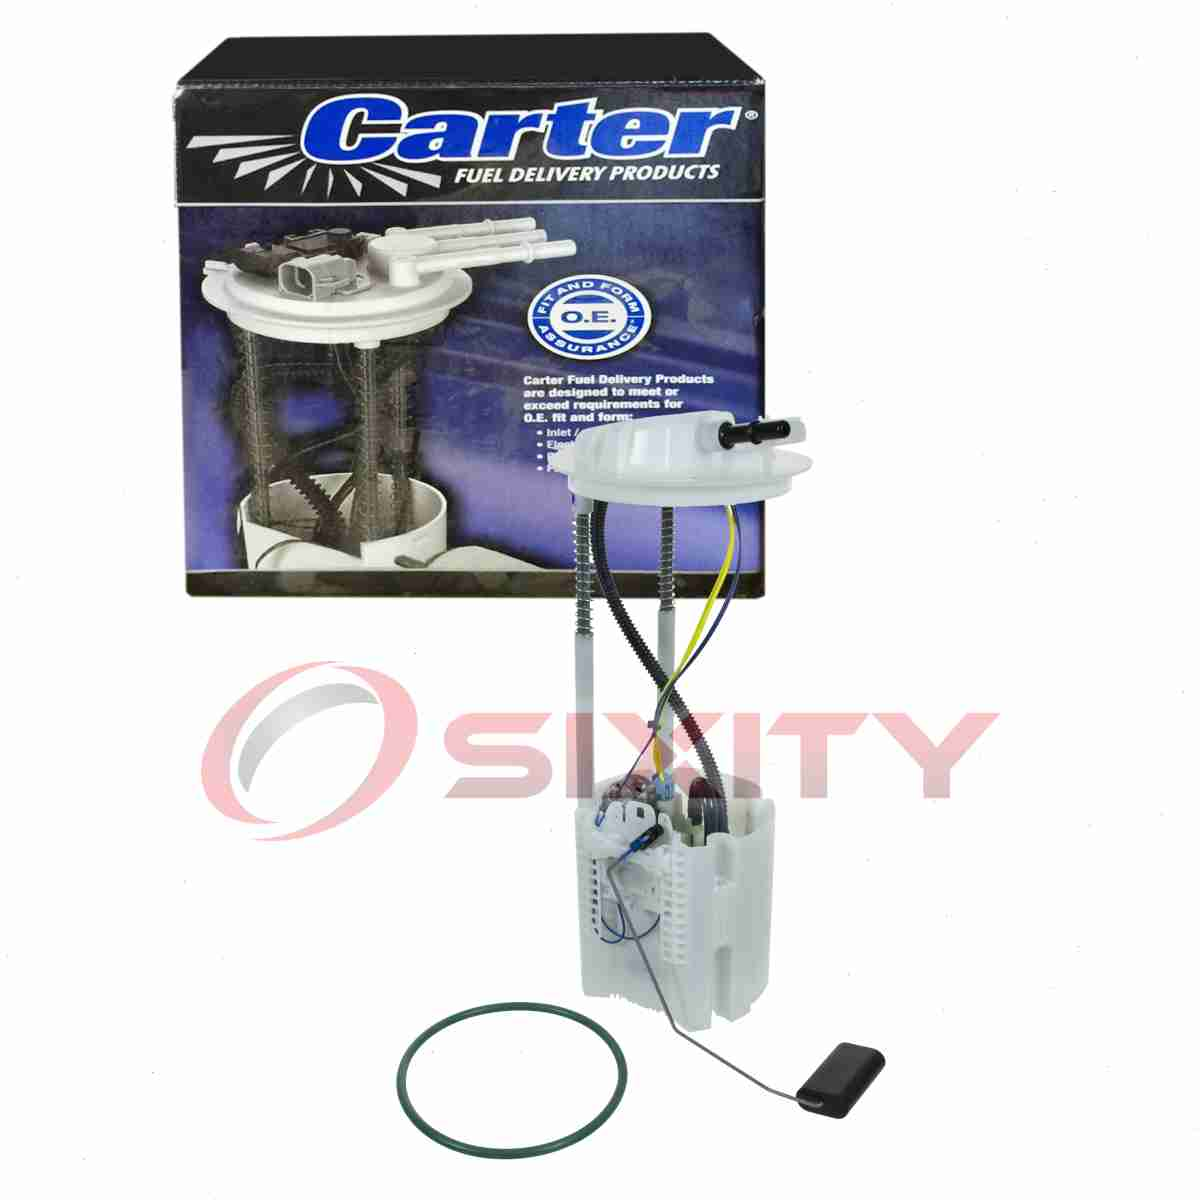 New Herko Fuel Pump Module Assembly 233GE For Dodge Ram 1500 09-10